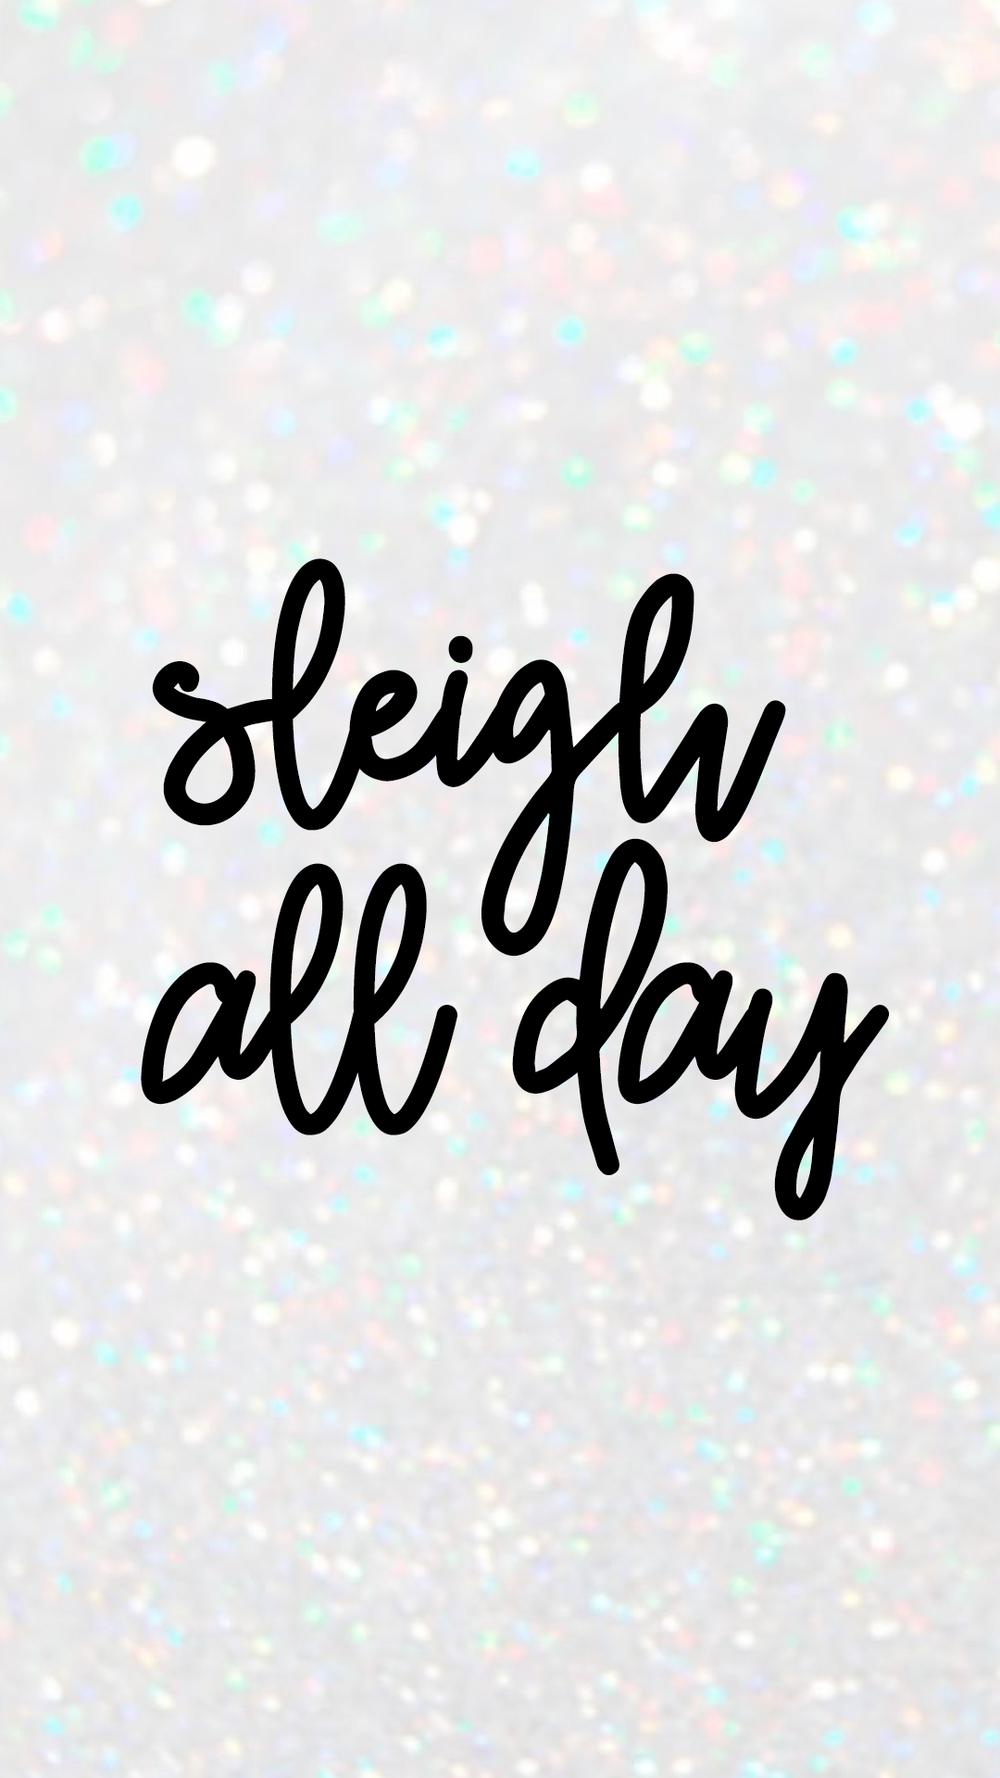 SLEIGH ALL DAY WALLPAPER -